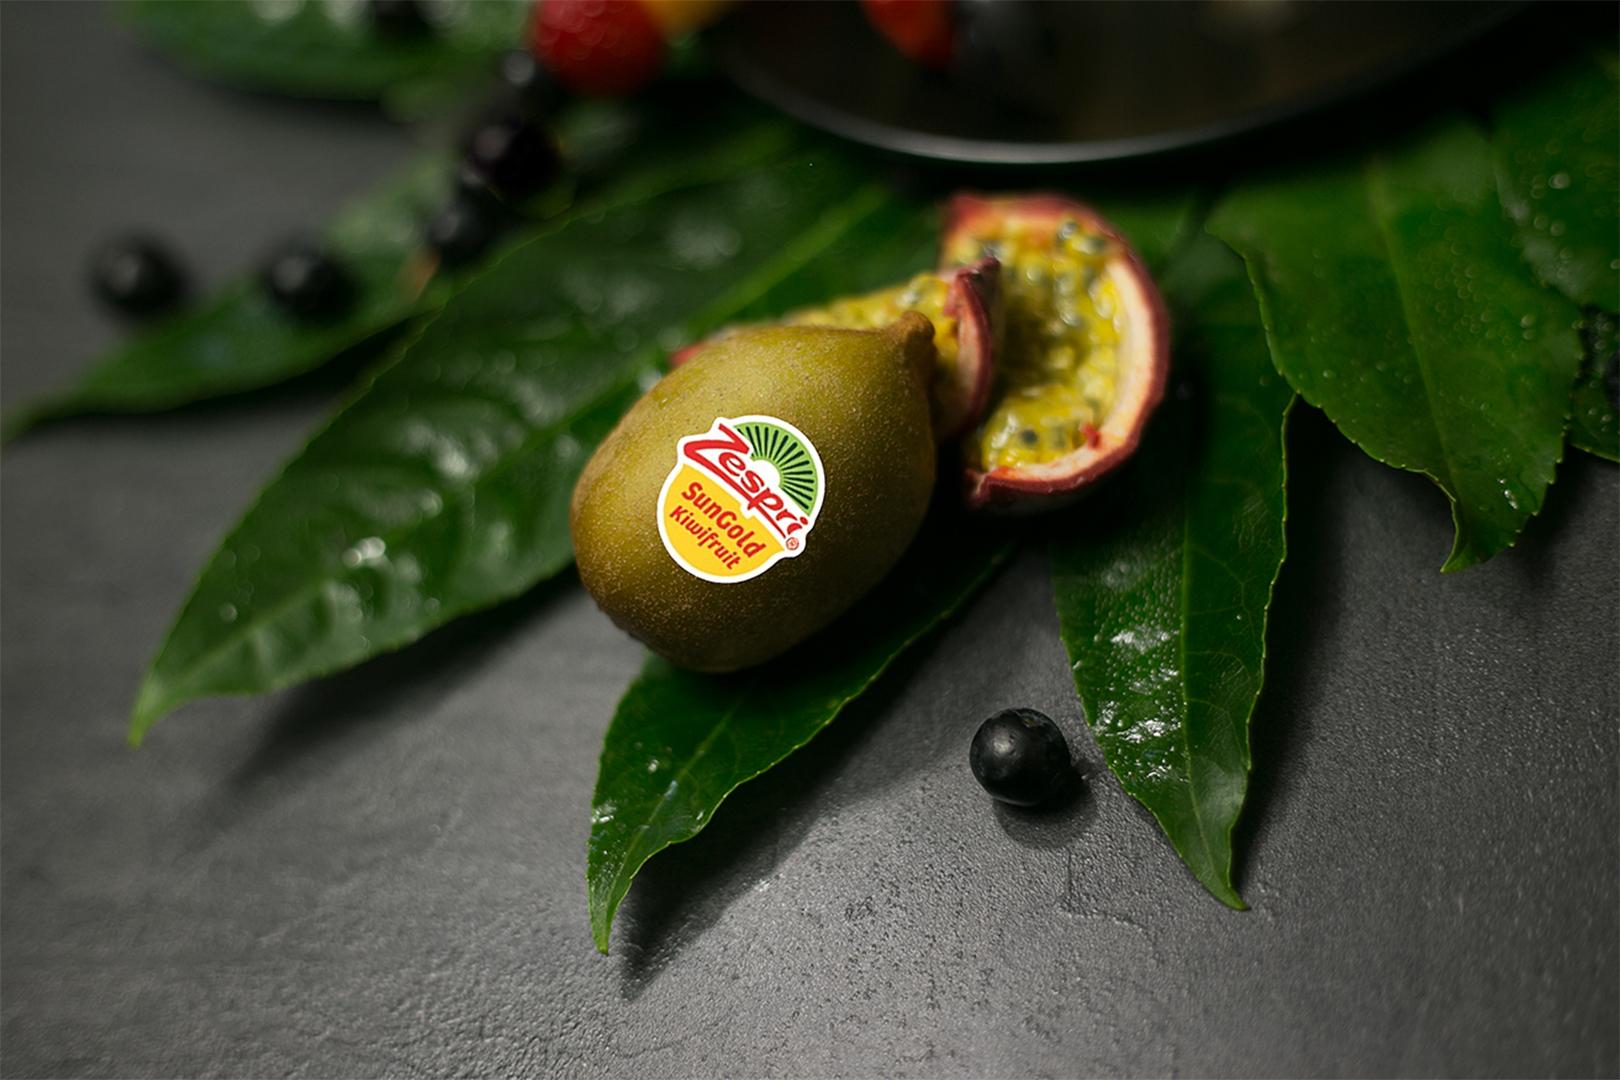 zespri-kiwi-sungold